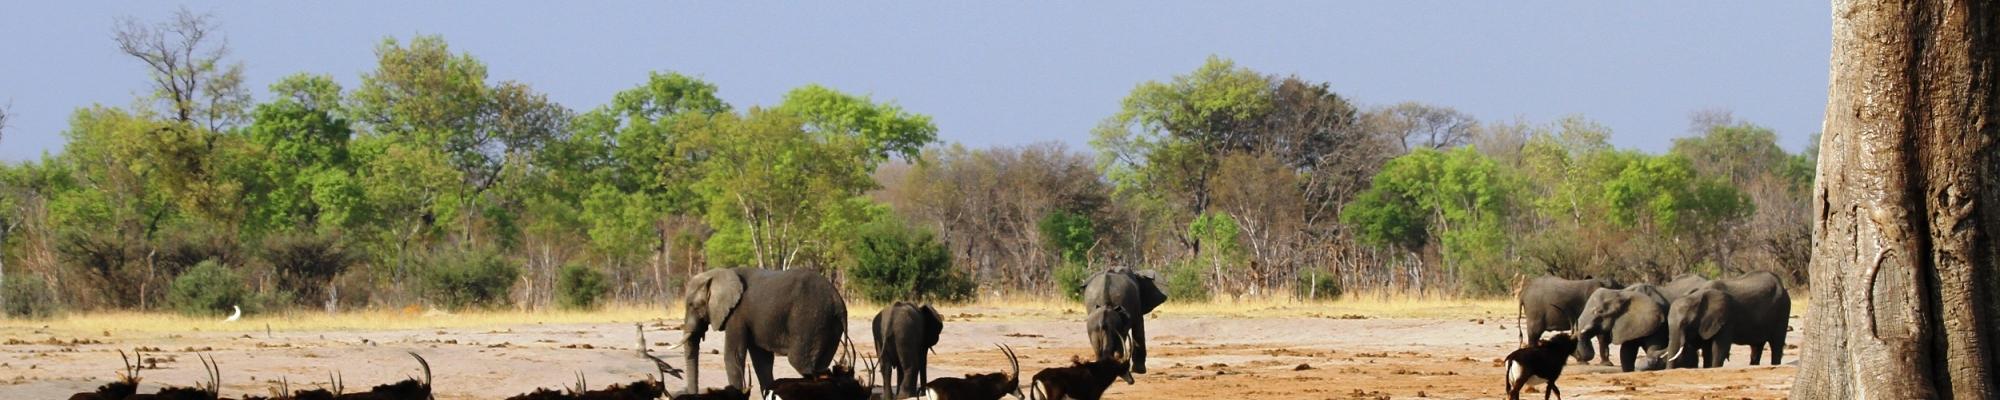 Safari Hwange Zimbabwe